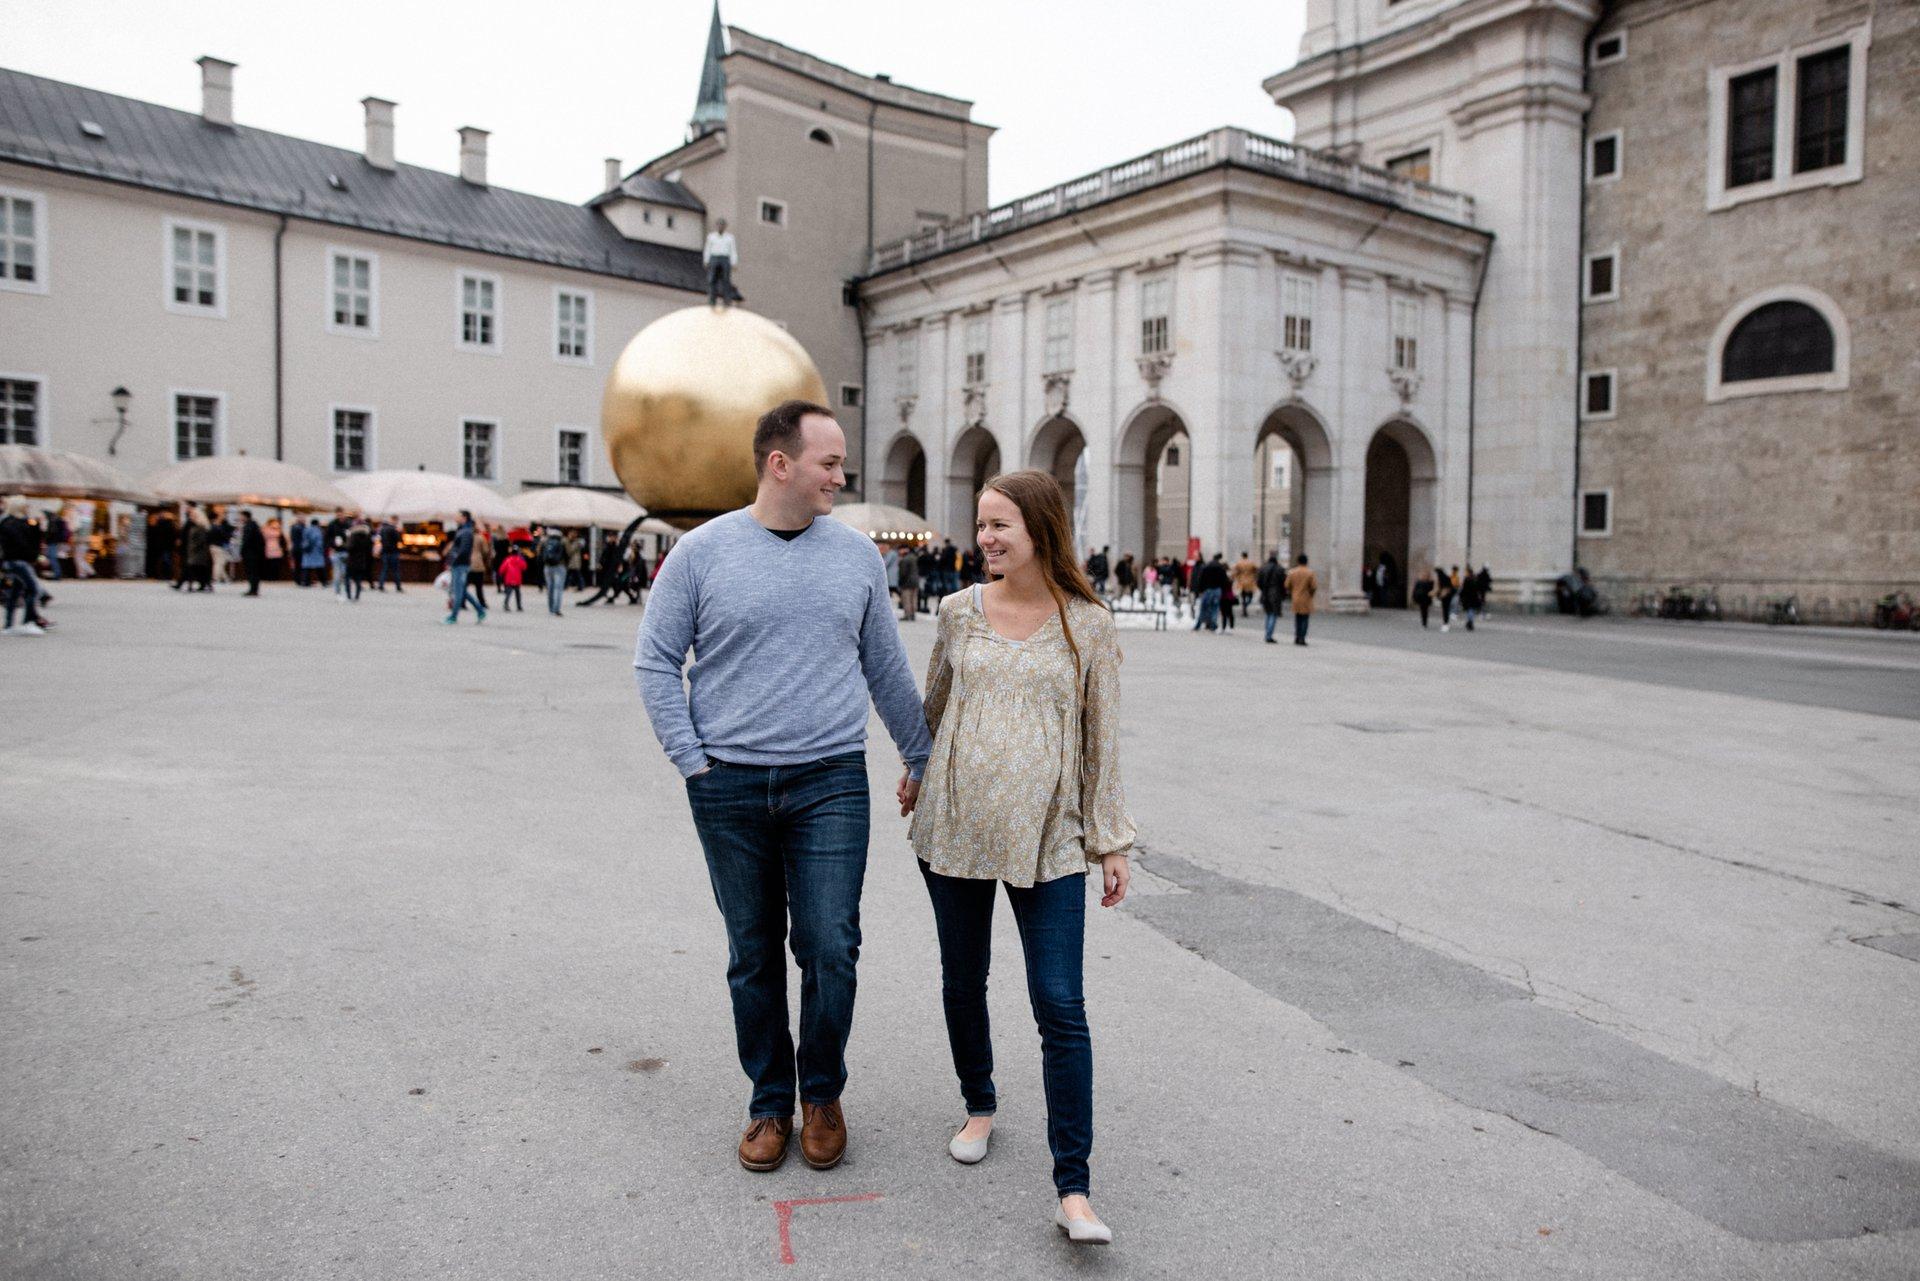 Salzburg-Austria-travel-story-Flytographer-4